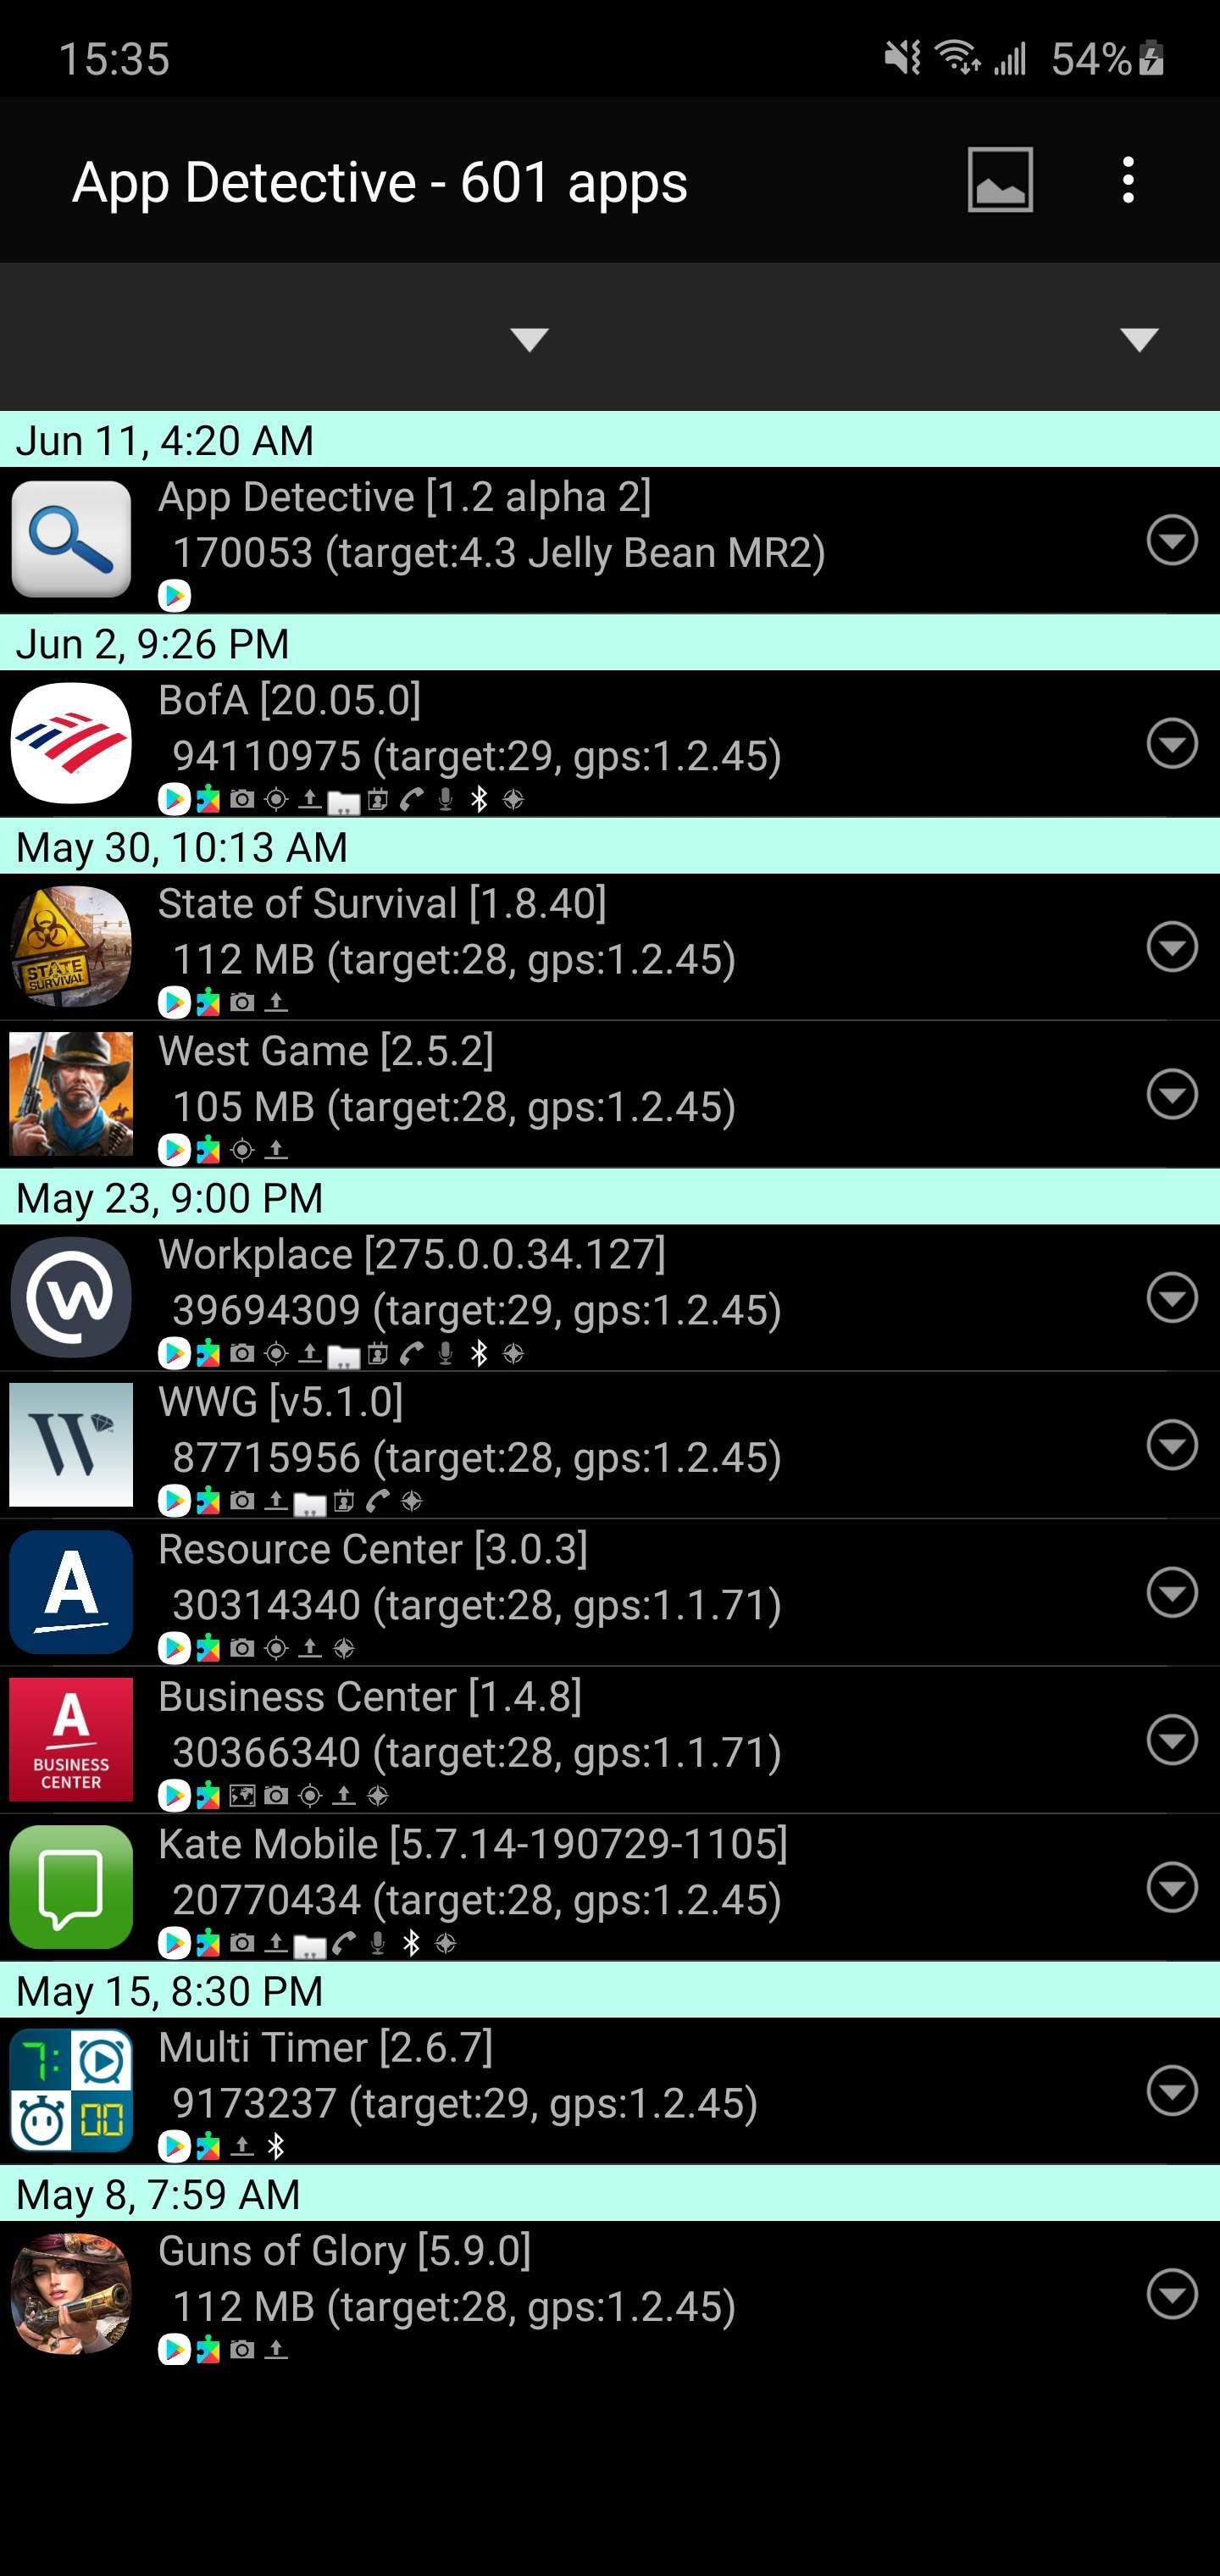 0_1599071387986_Screenshot_20200618-153516_App Detective.jpg